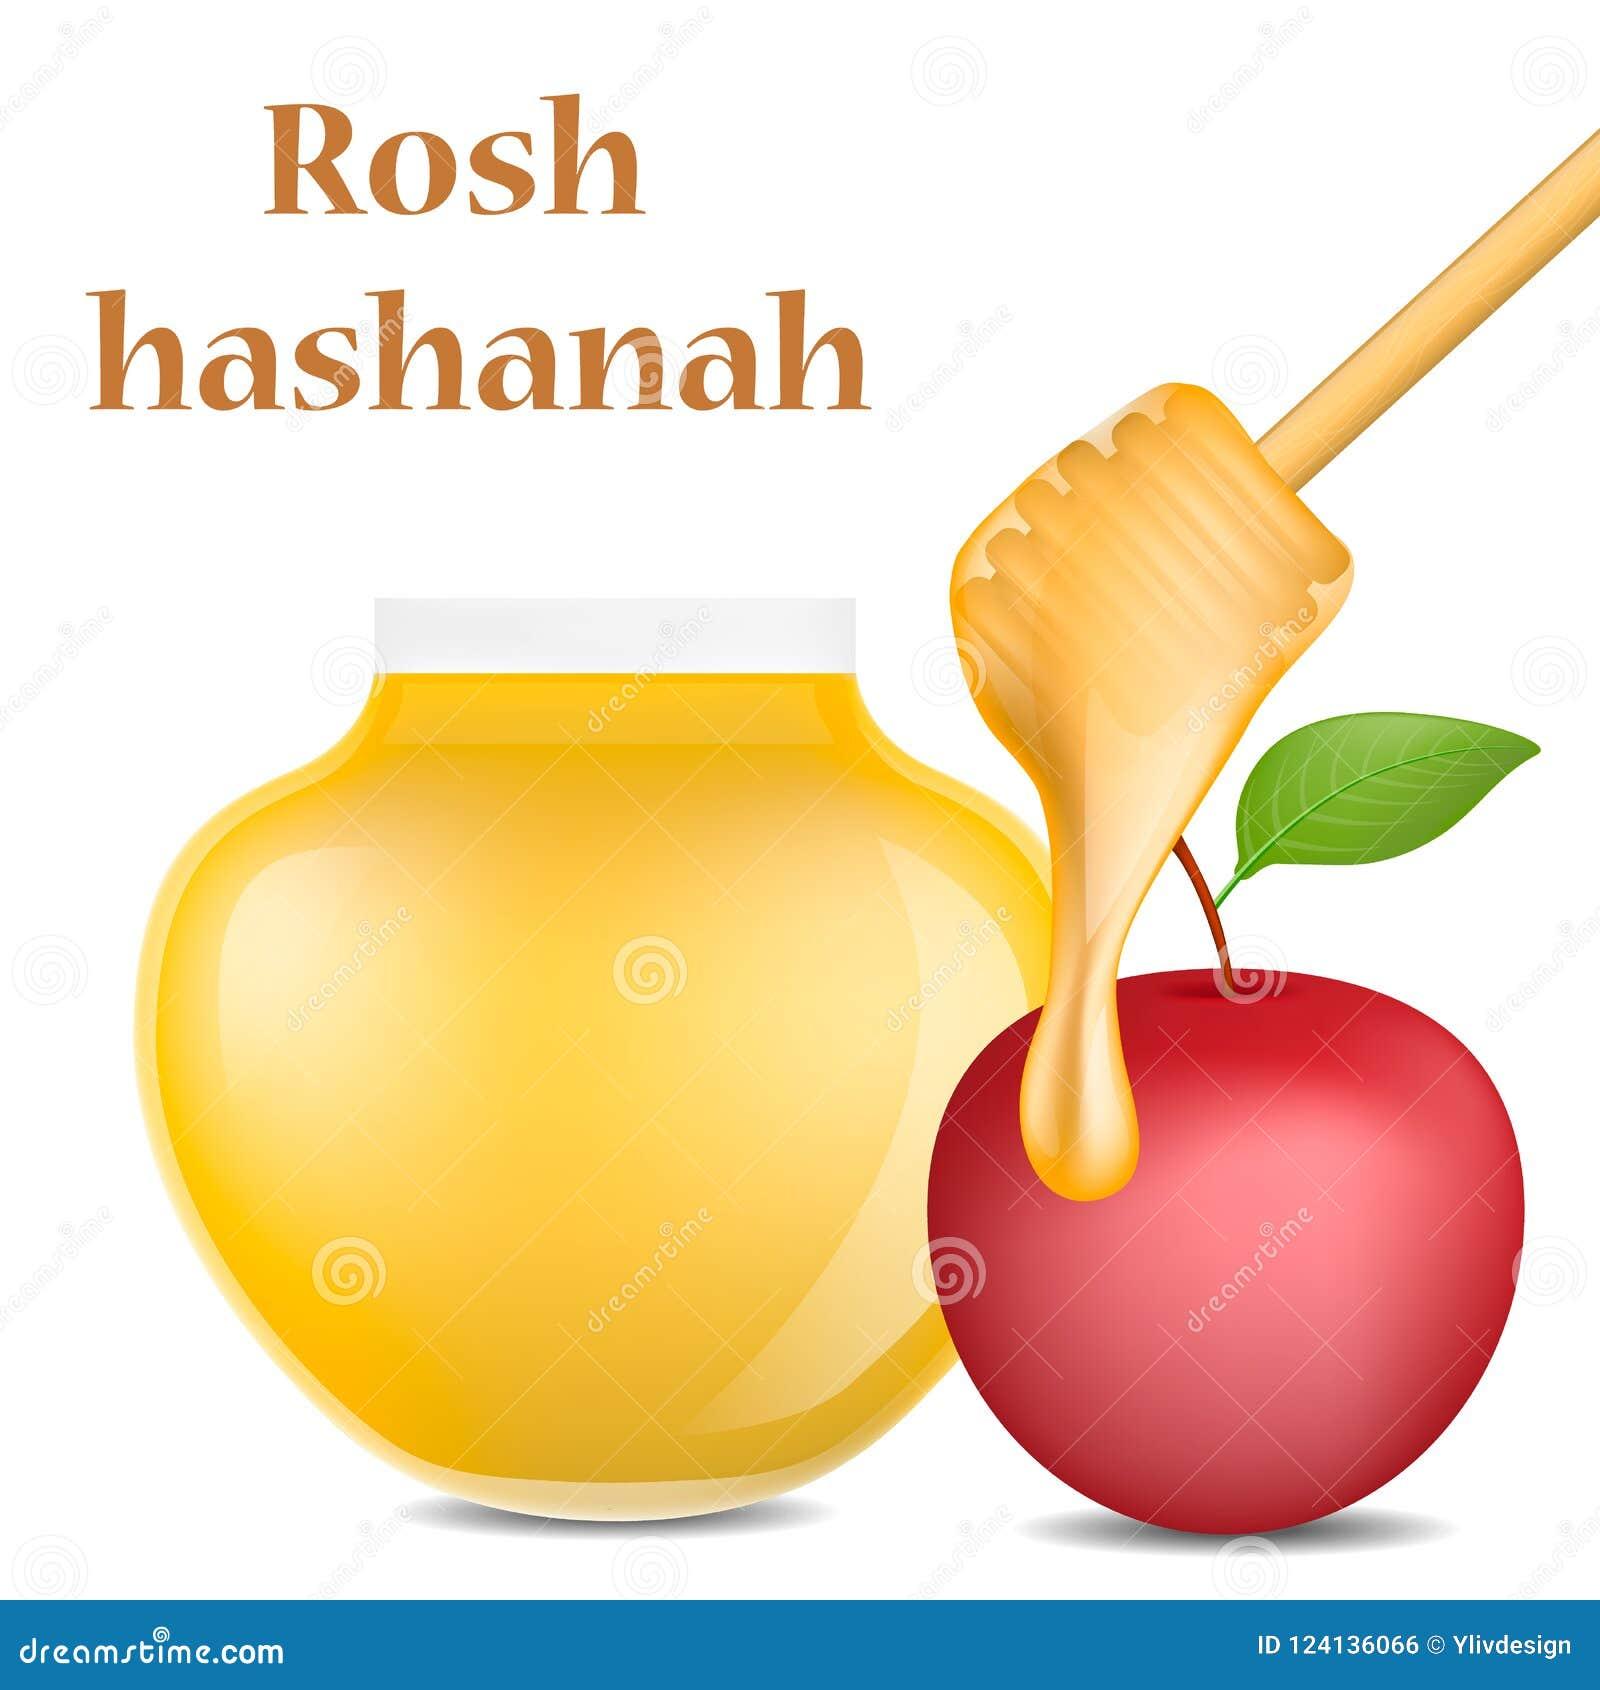 Rosh hashanah jewish religion concept background, realistic style